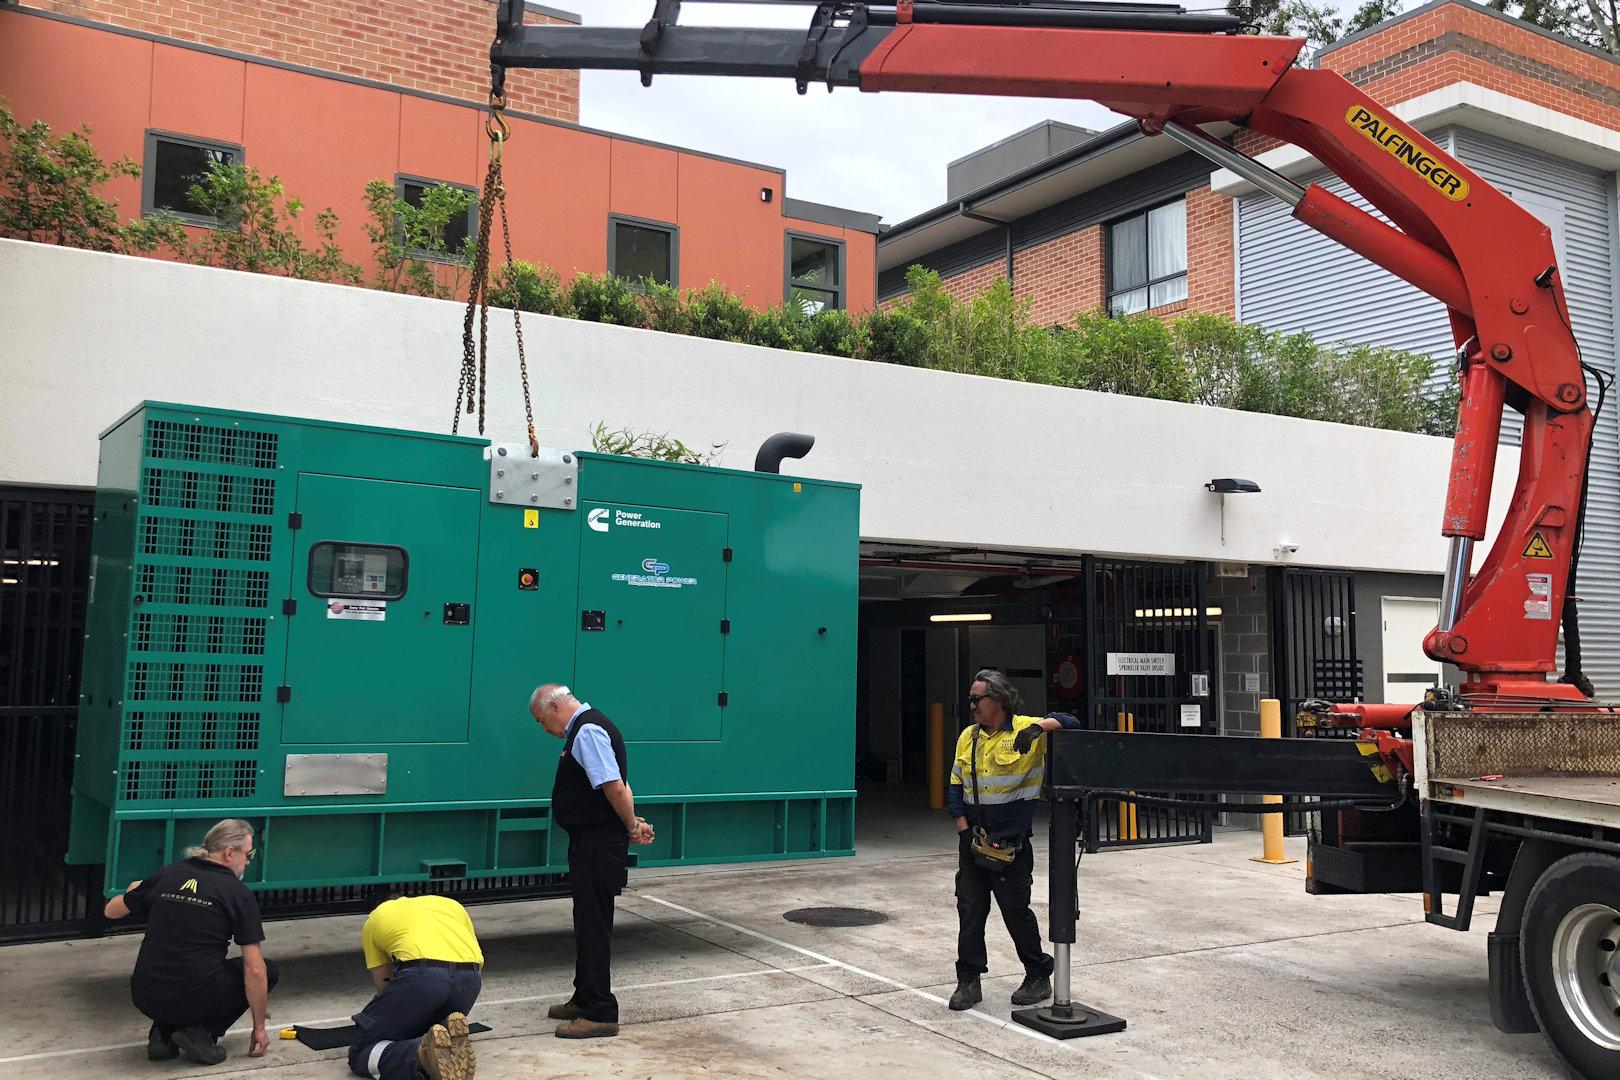 microngroup-cummins-diesel-generator-istallation-with-crane